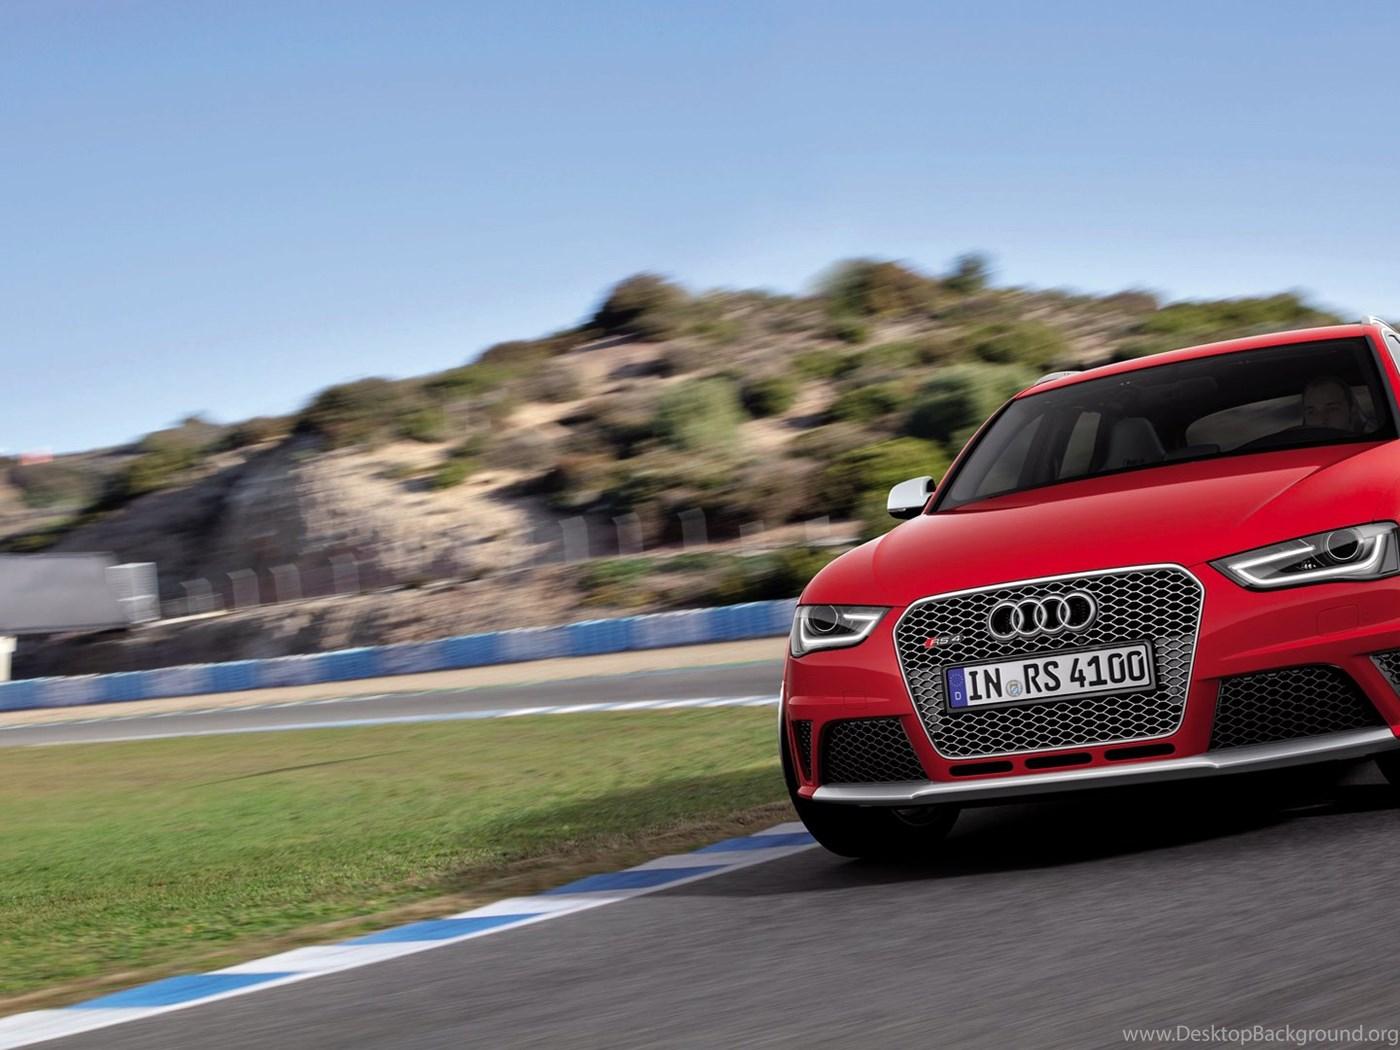 Audi Rs4 Wallpapers Image Desktop Background